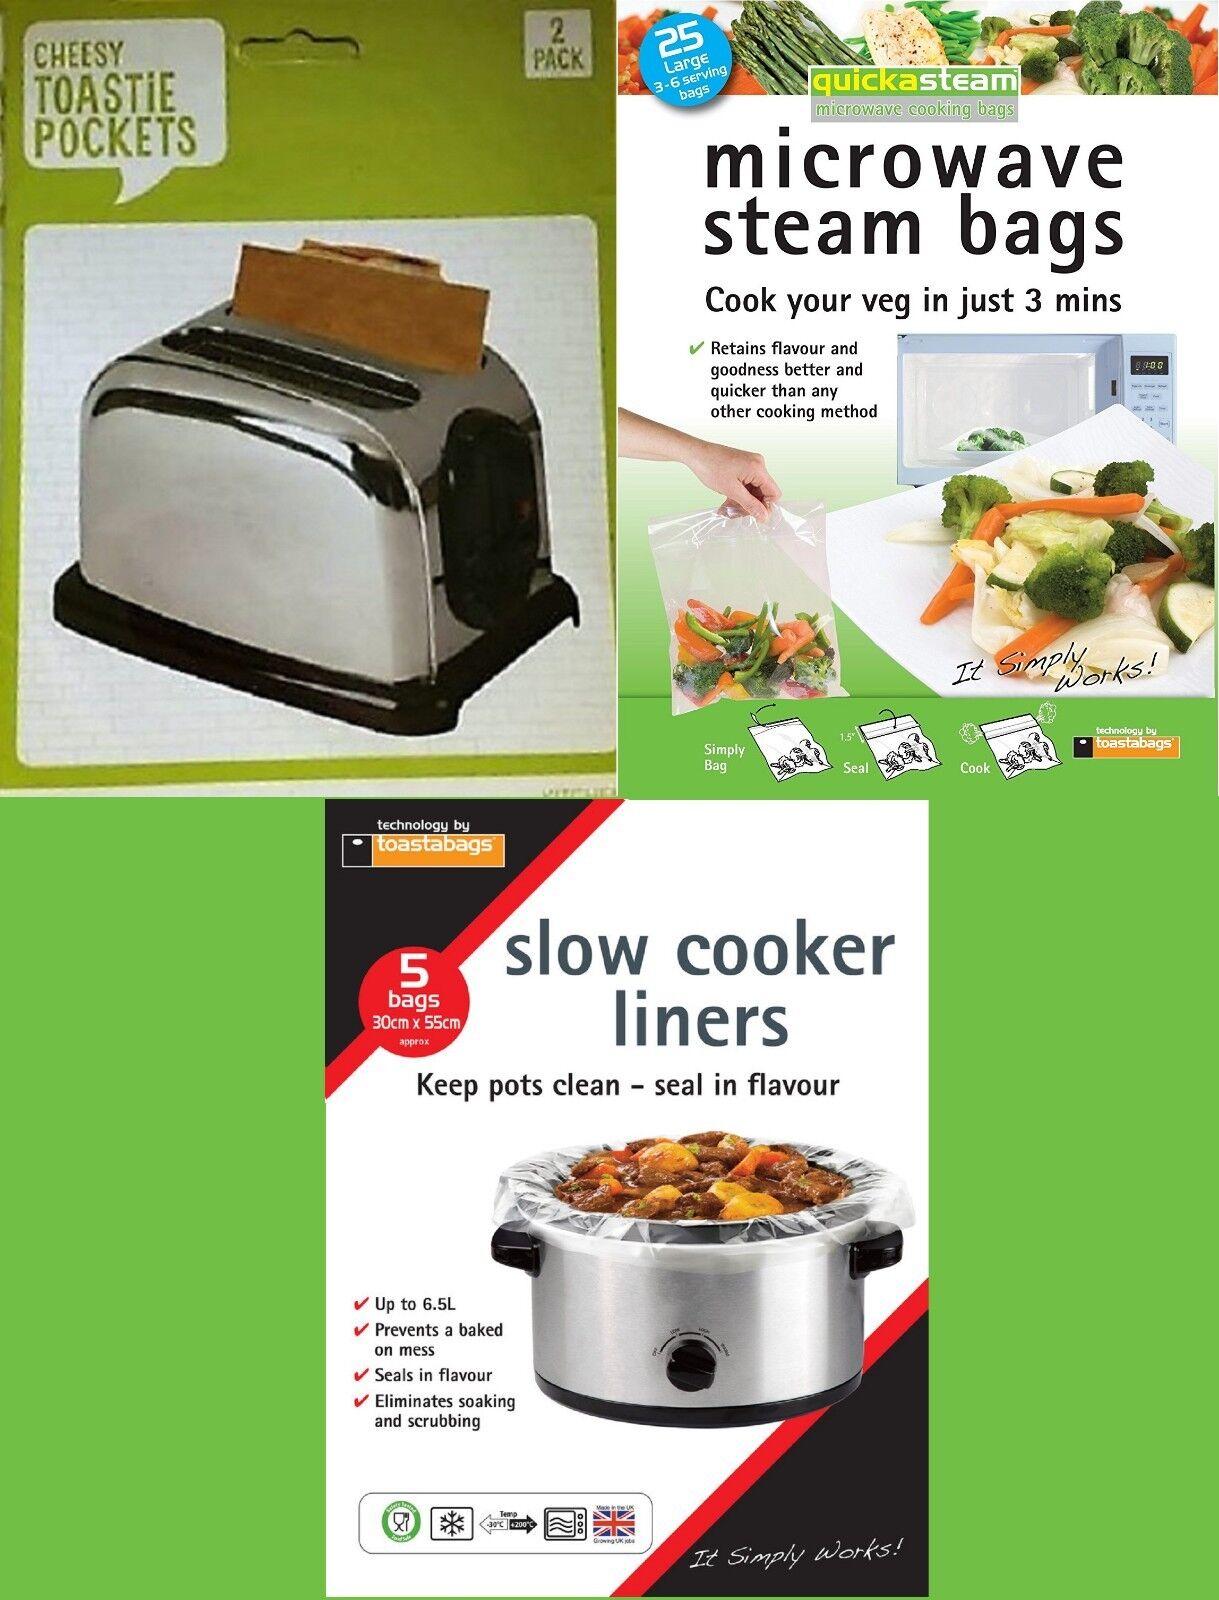 Toasted Sandwich Pockets,Roast Bag,Steam Bags,Slow Cooker Li